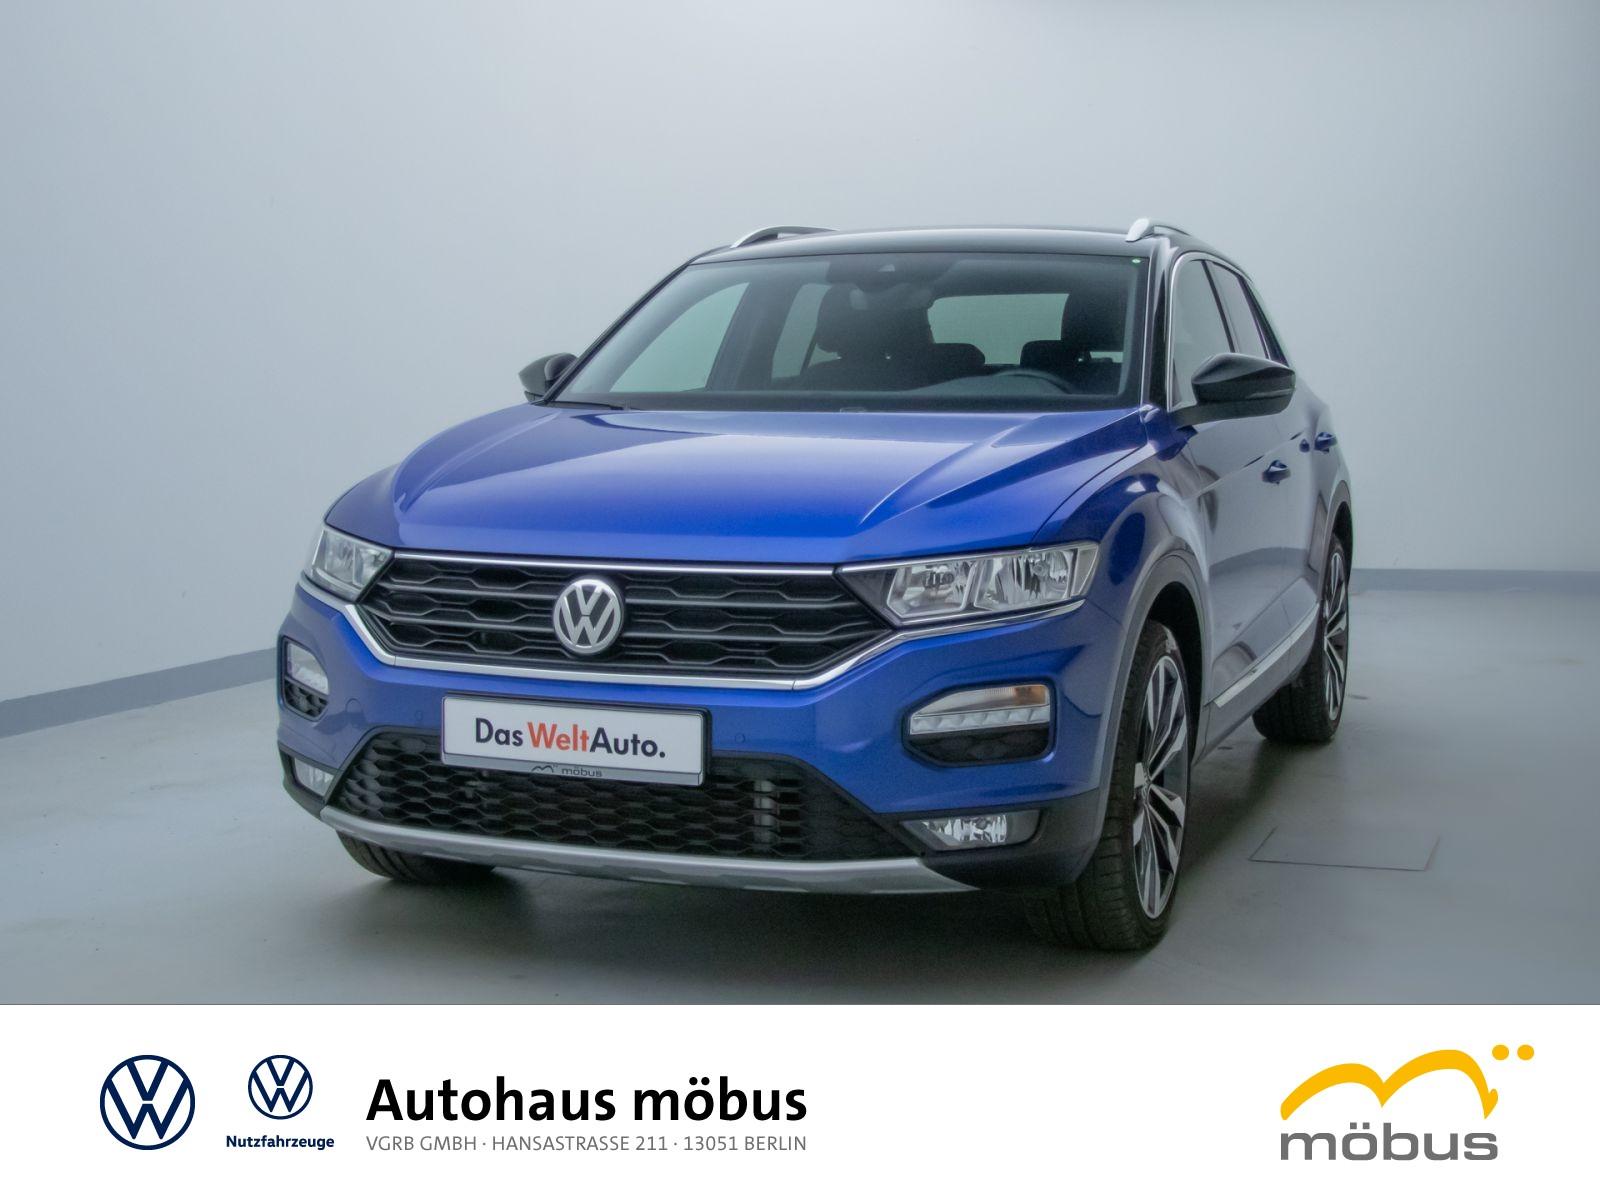 Volkswagen T-Roc 1.5 TSI DSG**SPORT*ASSIST*NAVI*PDC*KLIMA**, Jahr 2020, Benzin